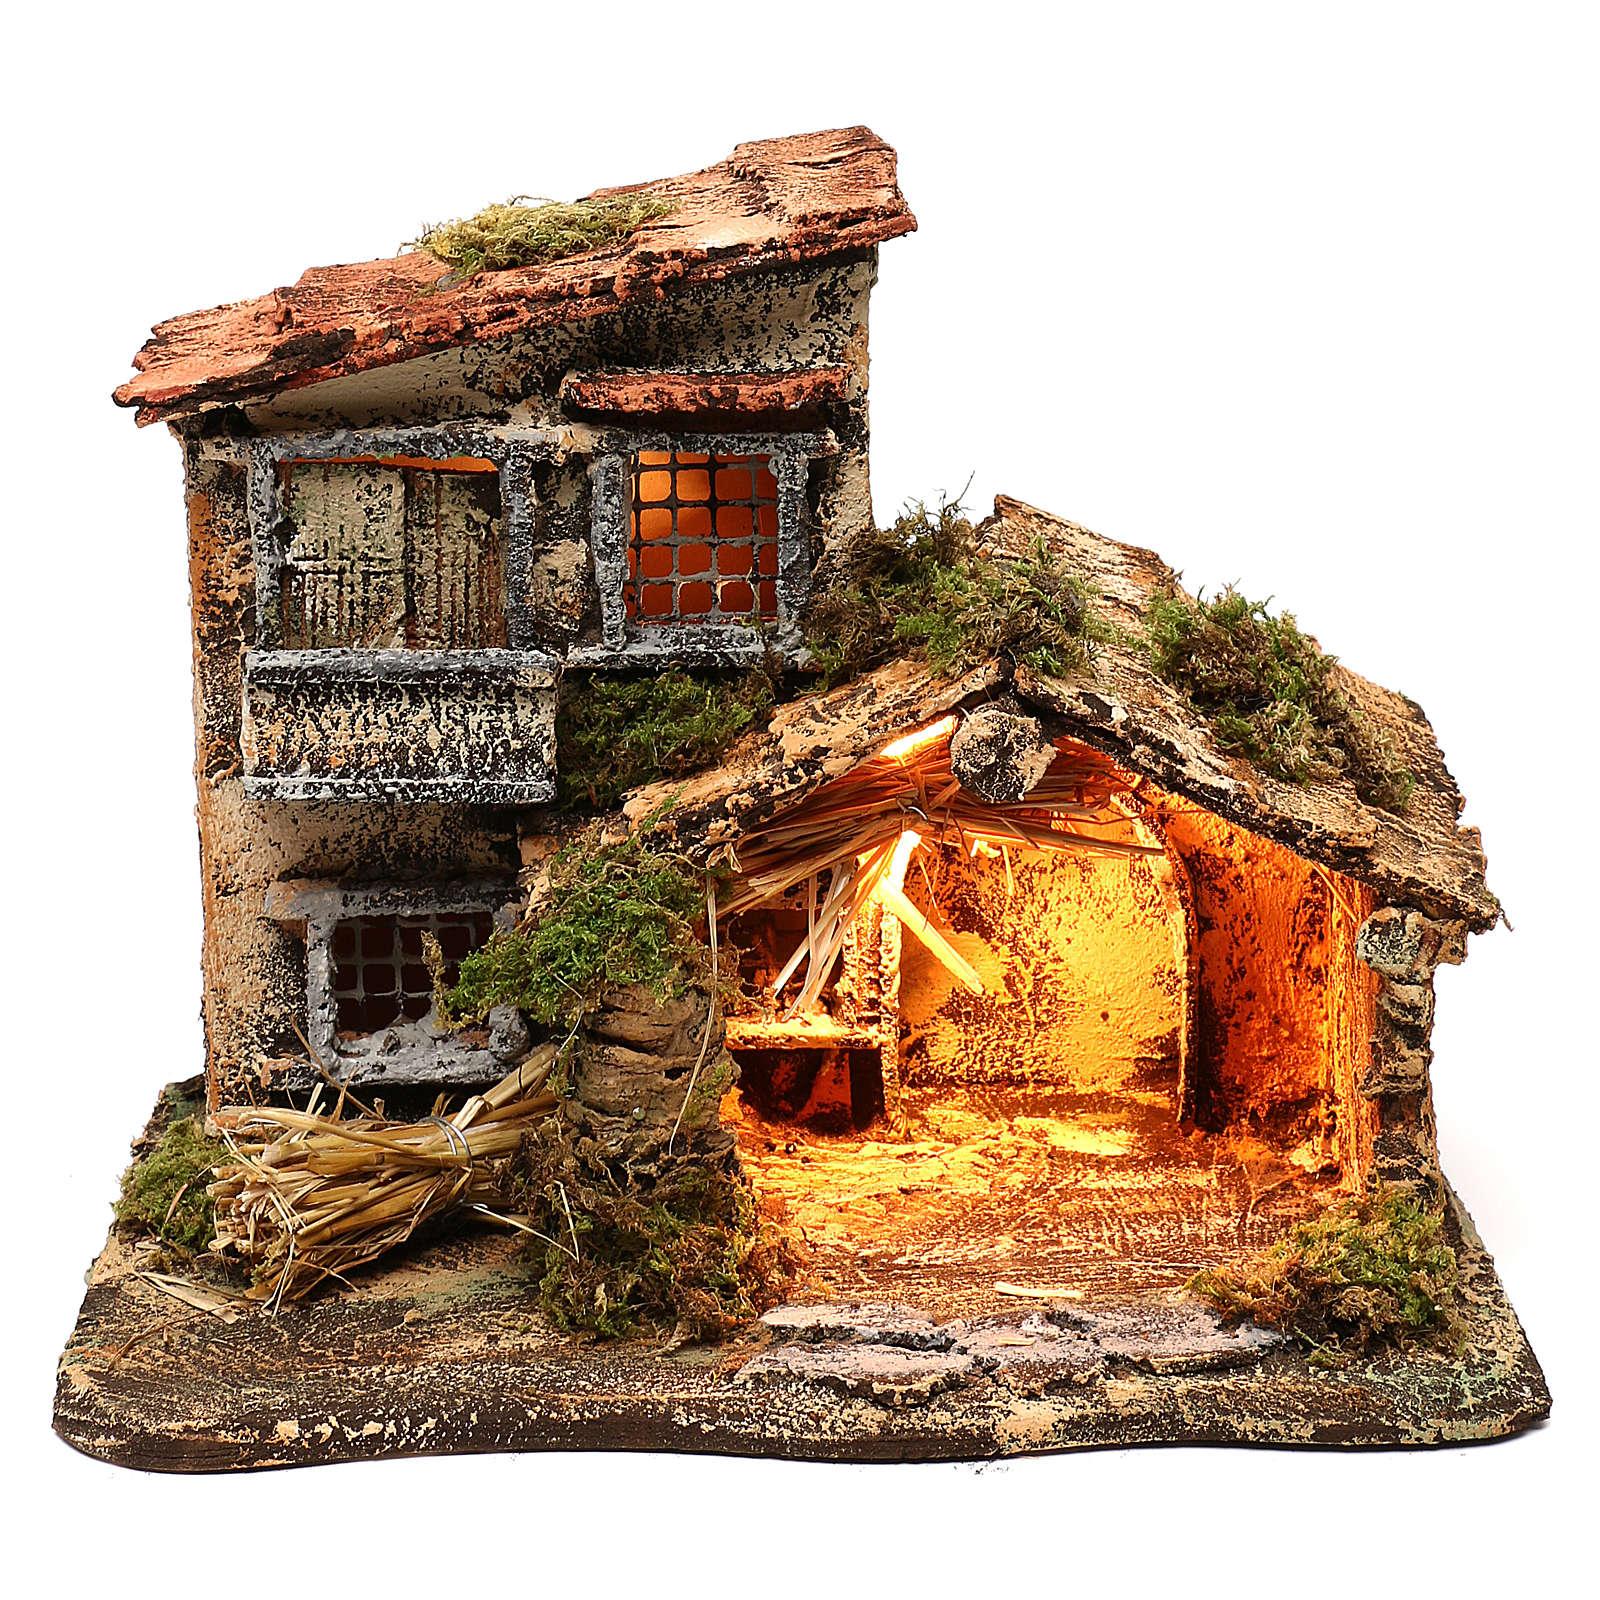 Hut with light for Nativity scene 35x25x30 cm 4